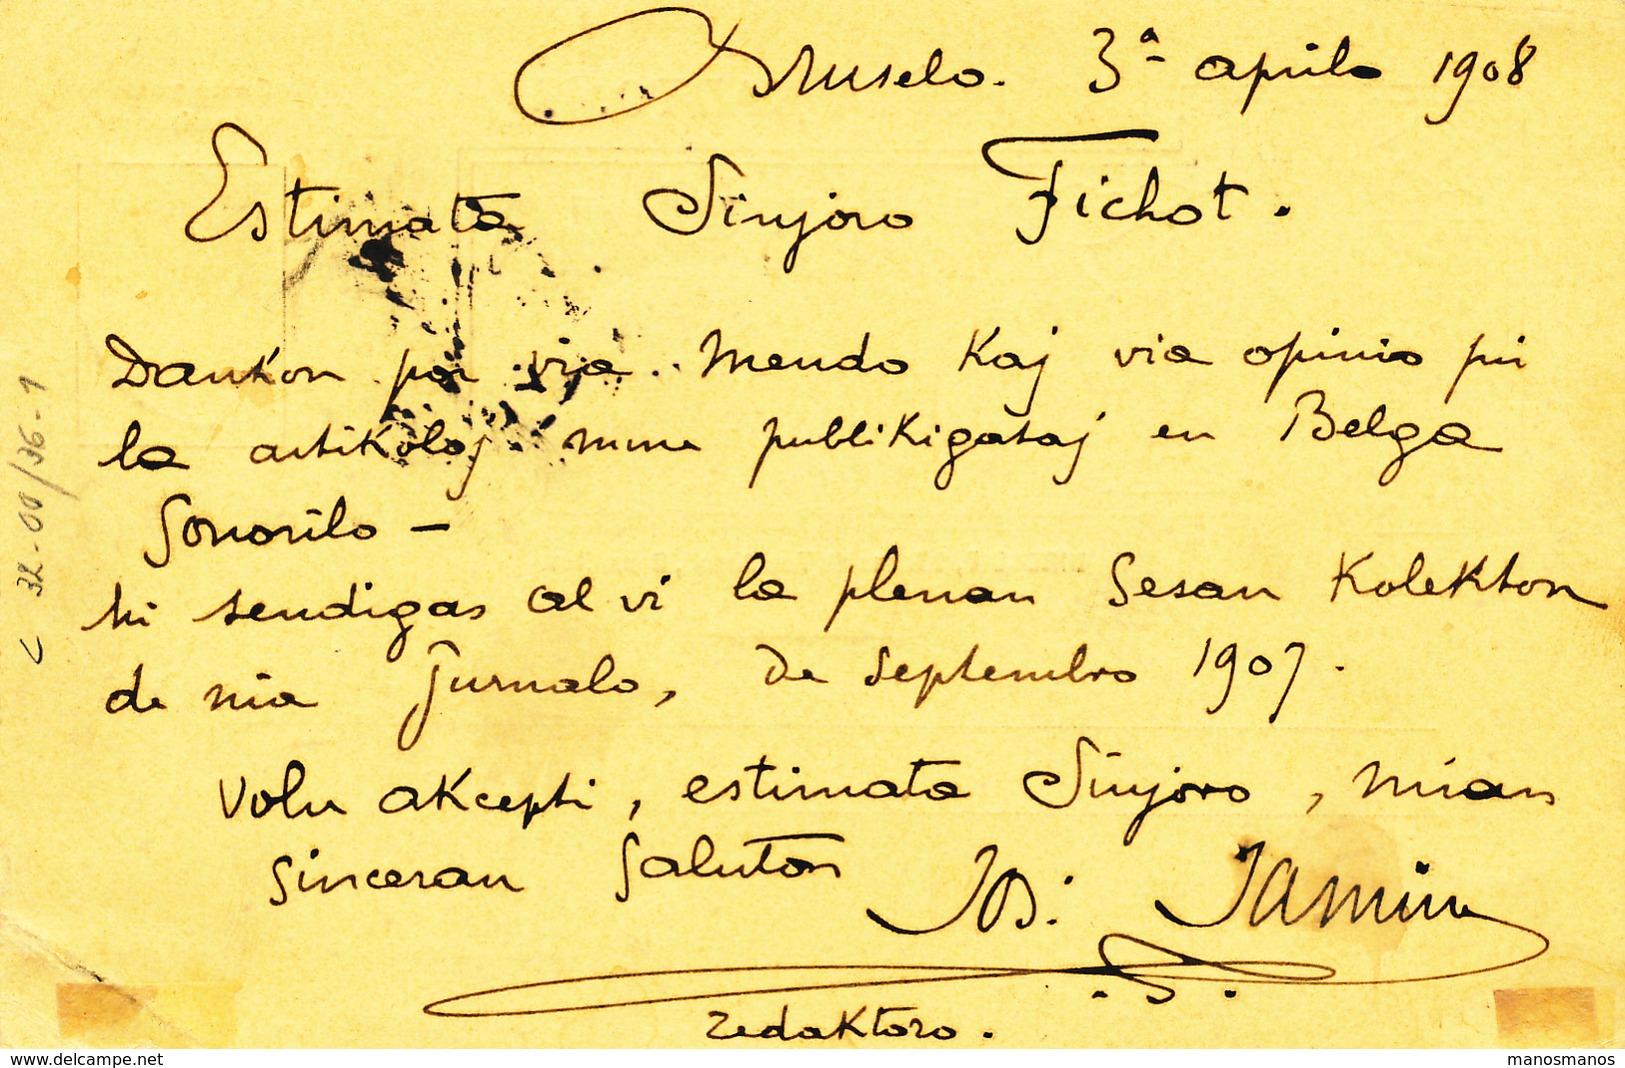 040/27 - BELGIQUE ESPERANTO - Carte Illustrée Journal En Esperanto La Belga Sonorilo - TP Grosse Barbe BRUXELLES 1908 - Esperanto